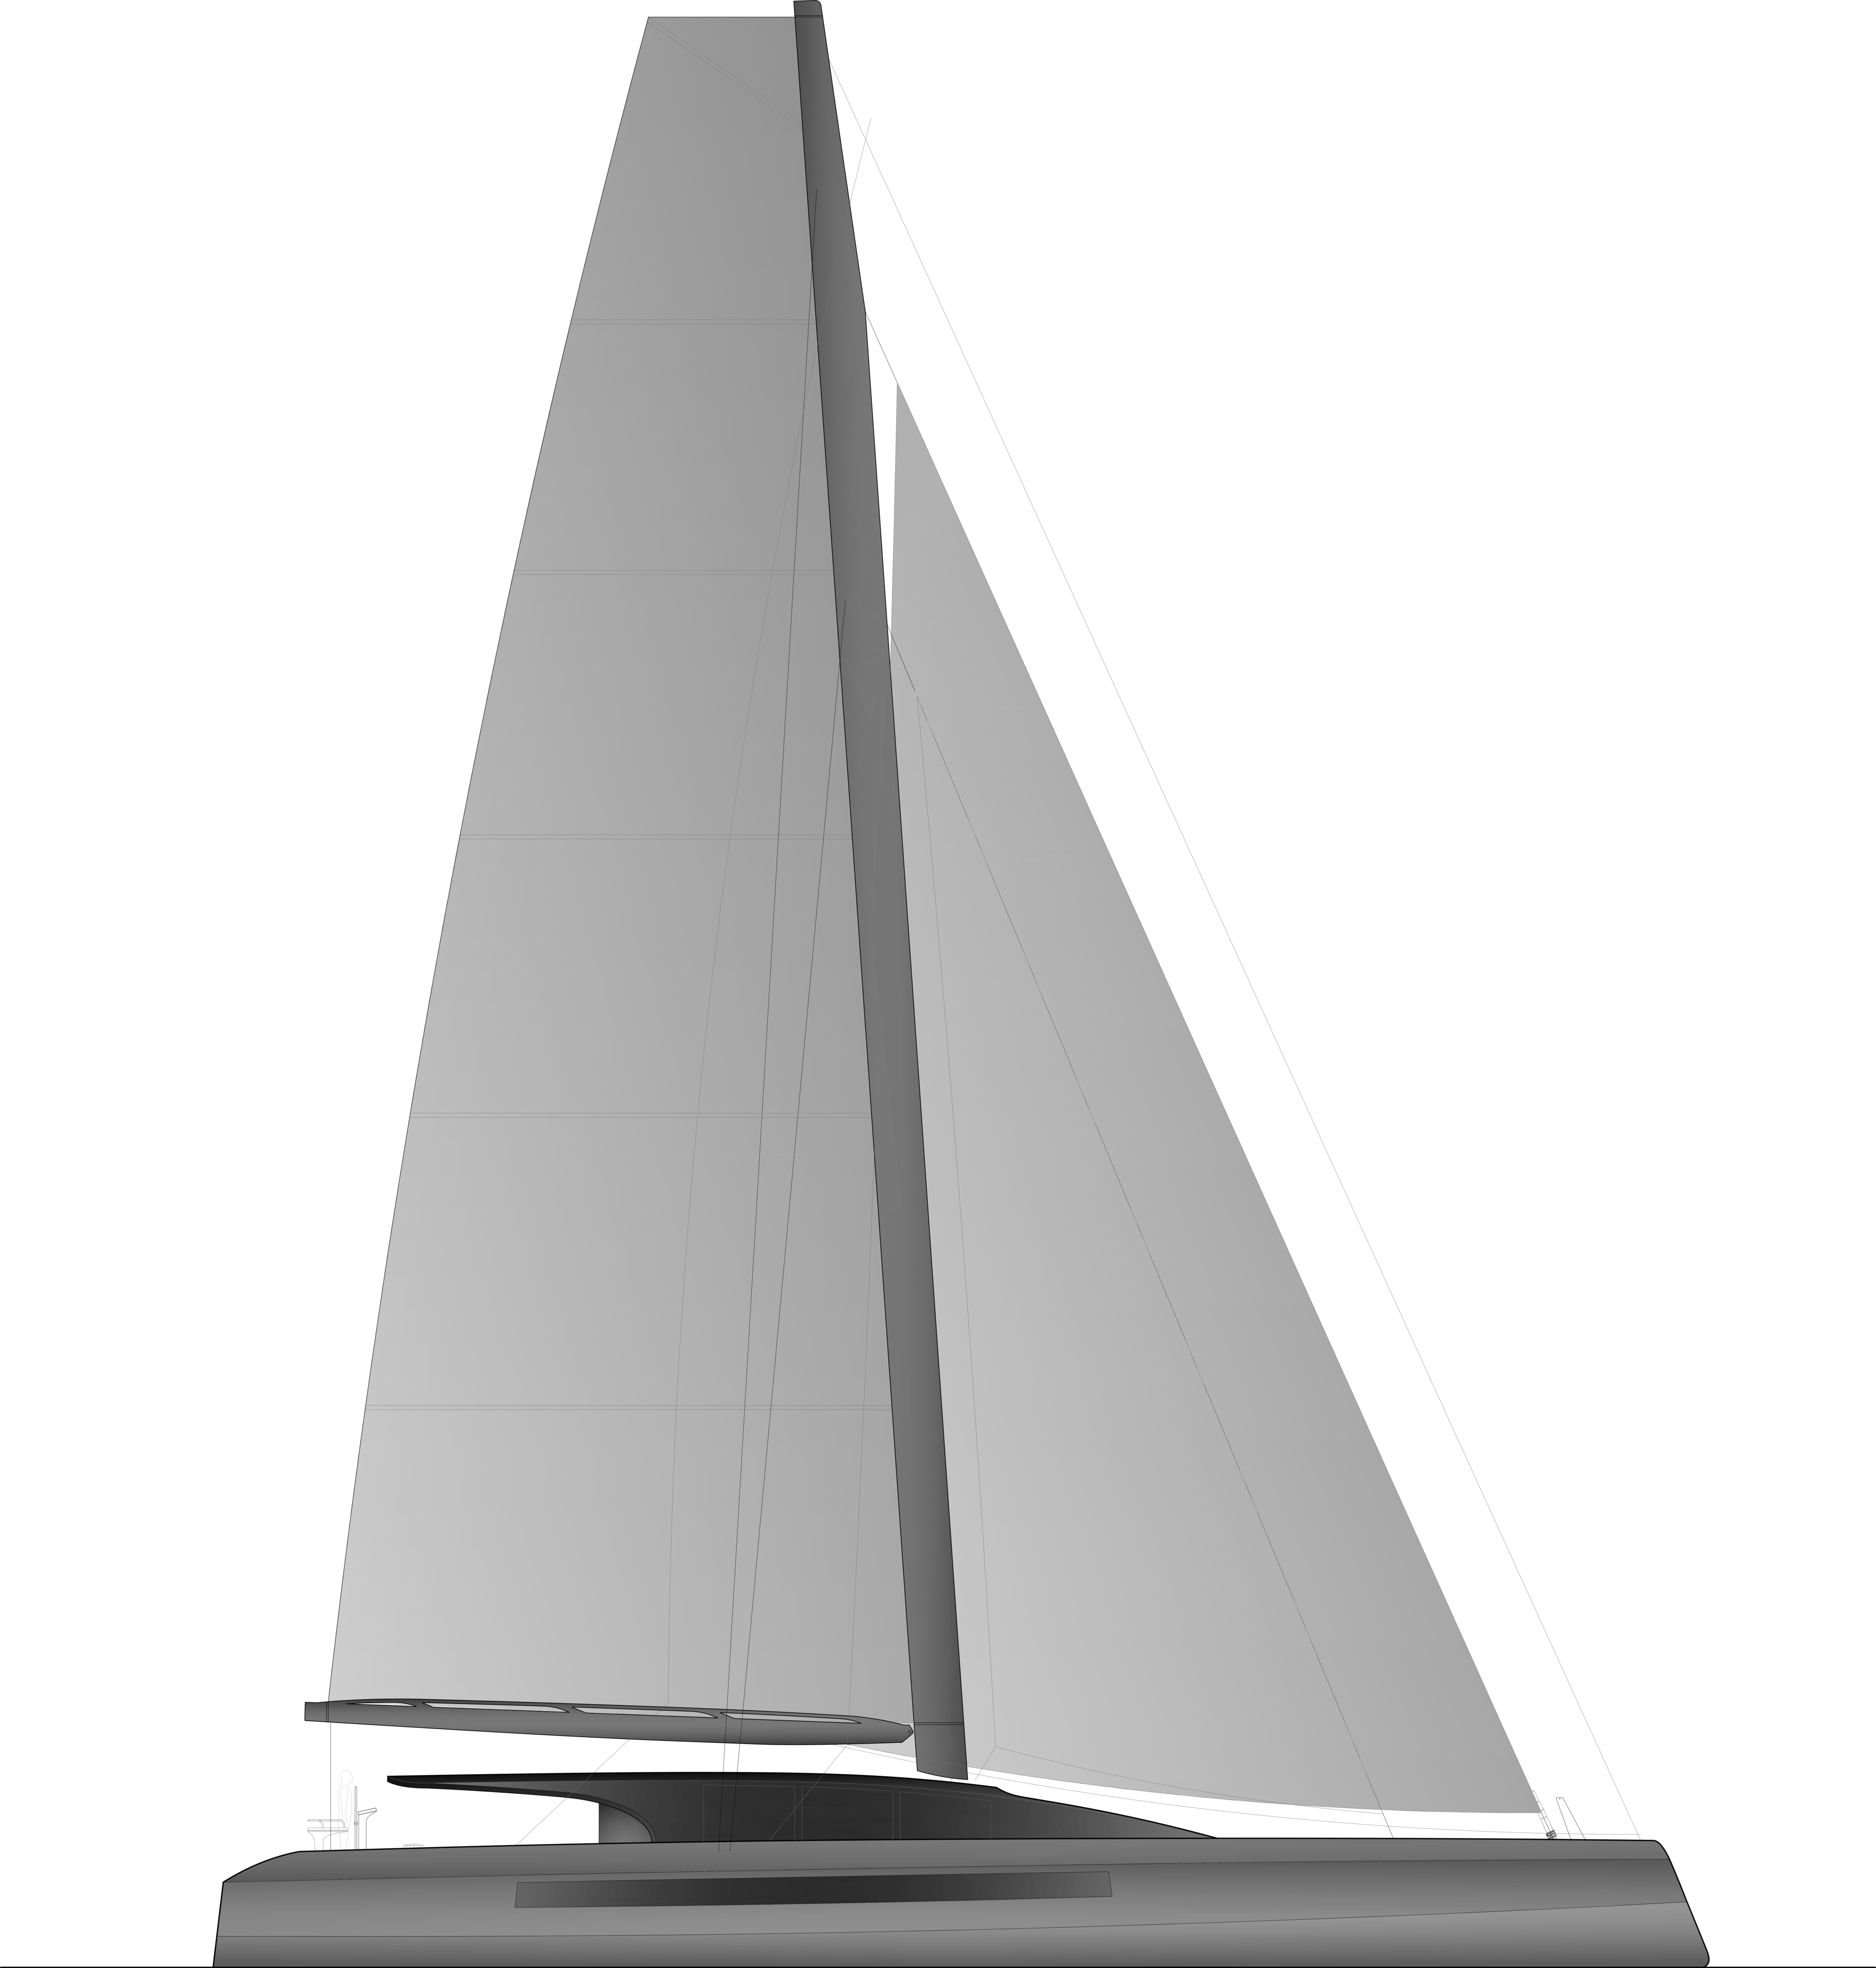 MMYD_066_BlackCat 30_Sail Plan 3_publicity.png